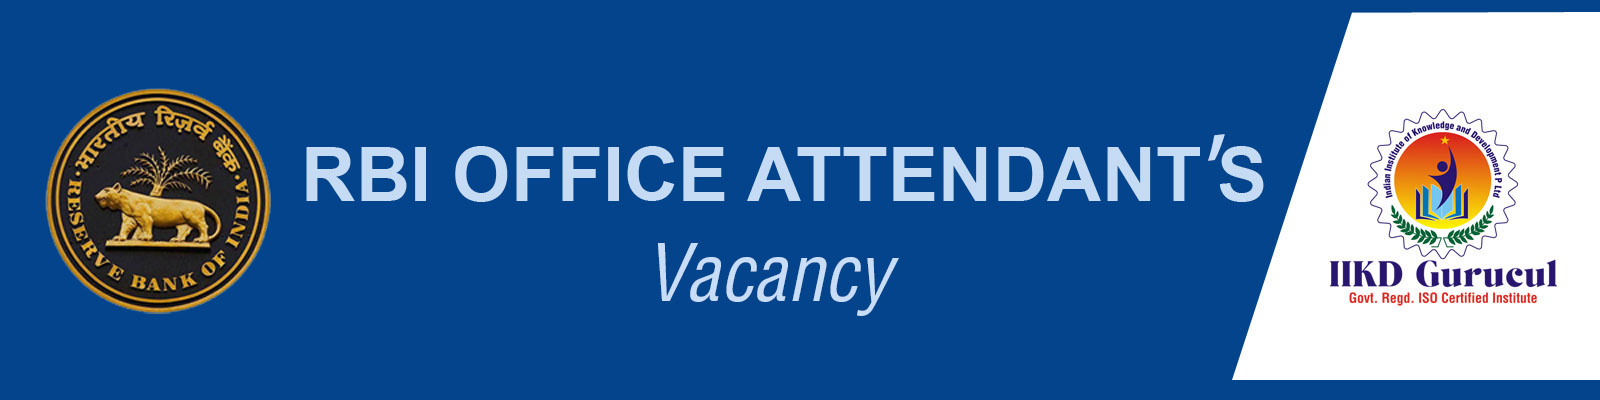 rbi office attendant vacancies